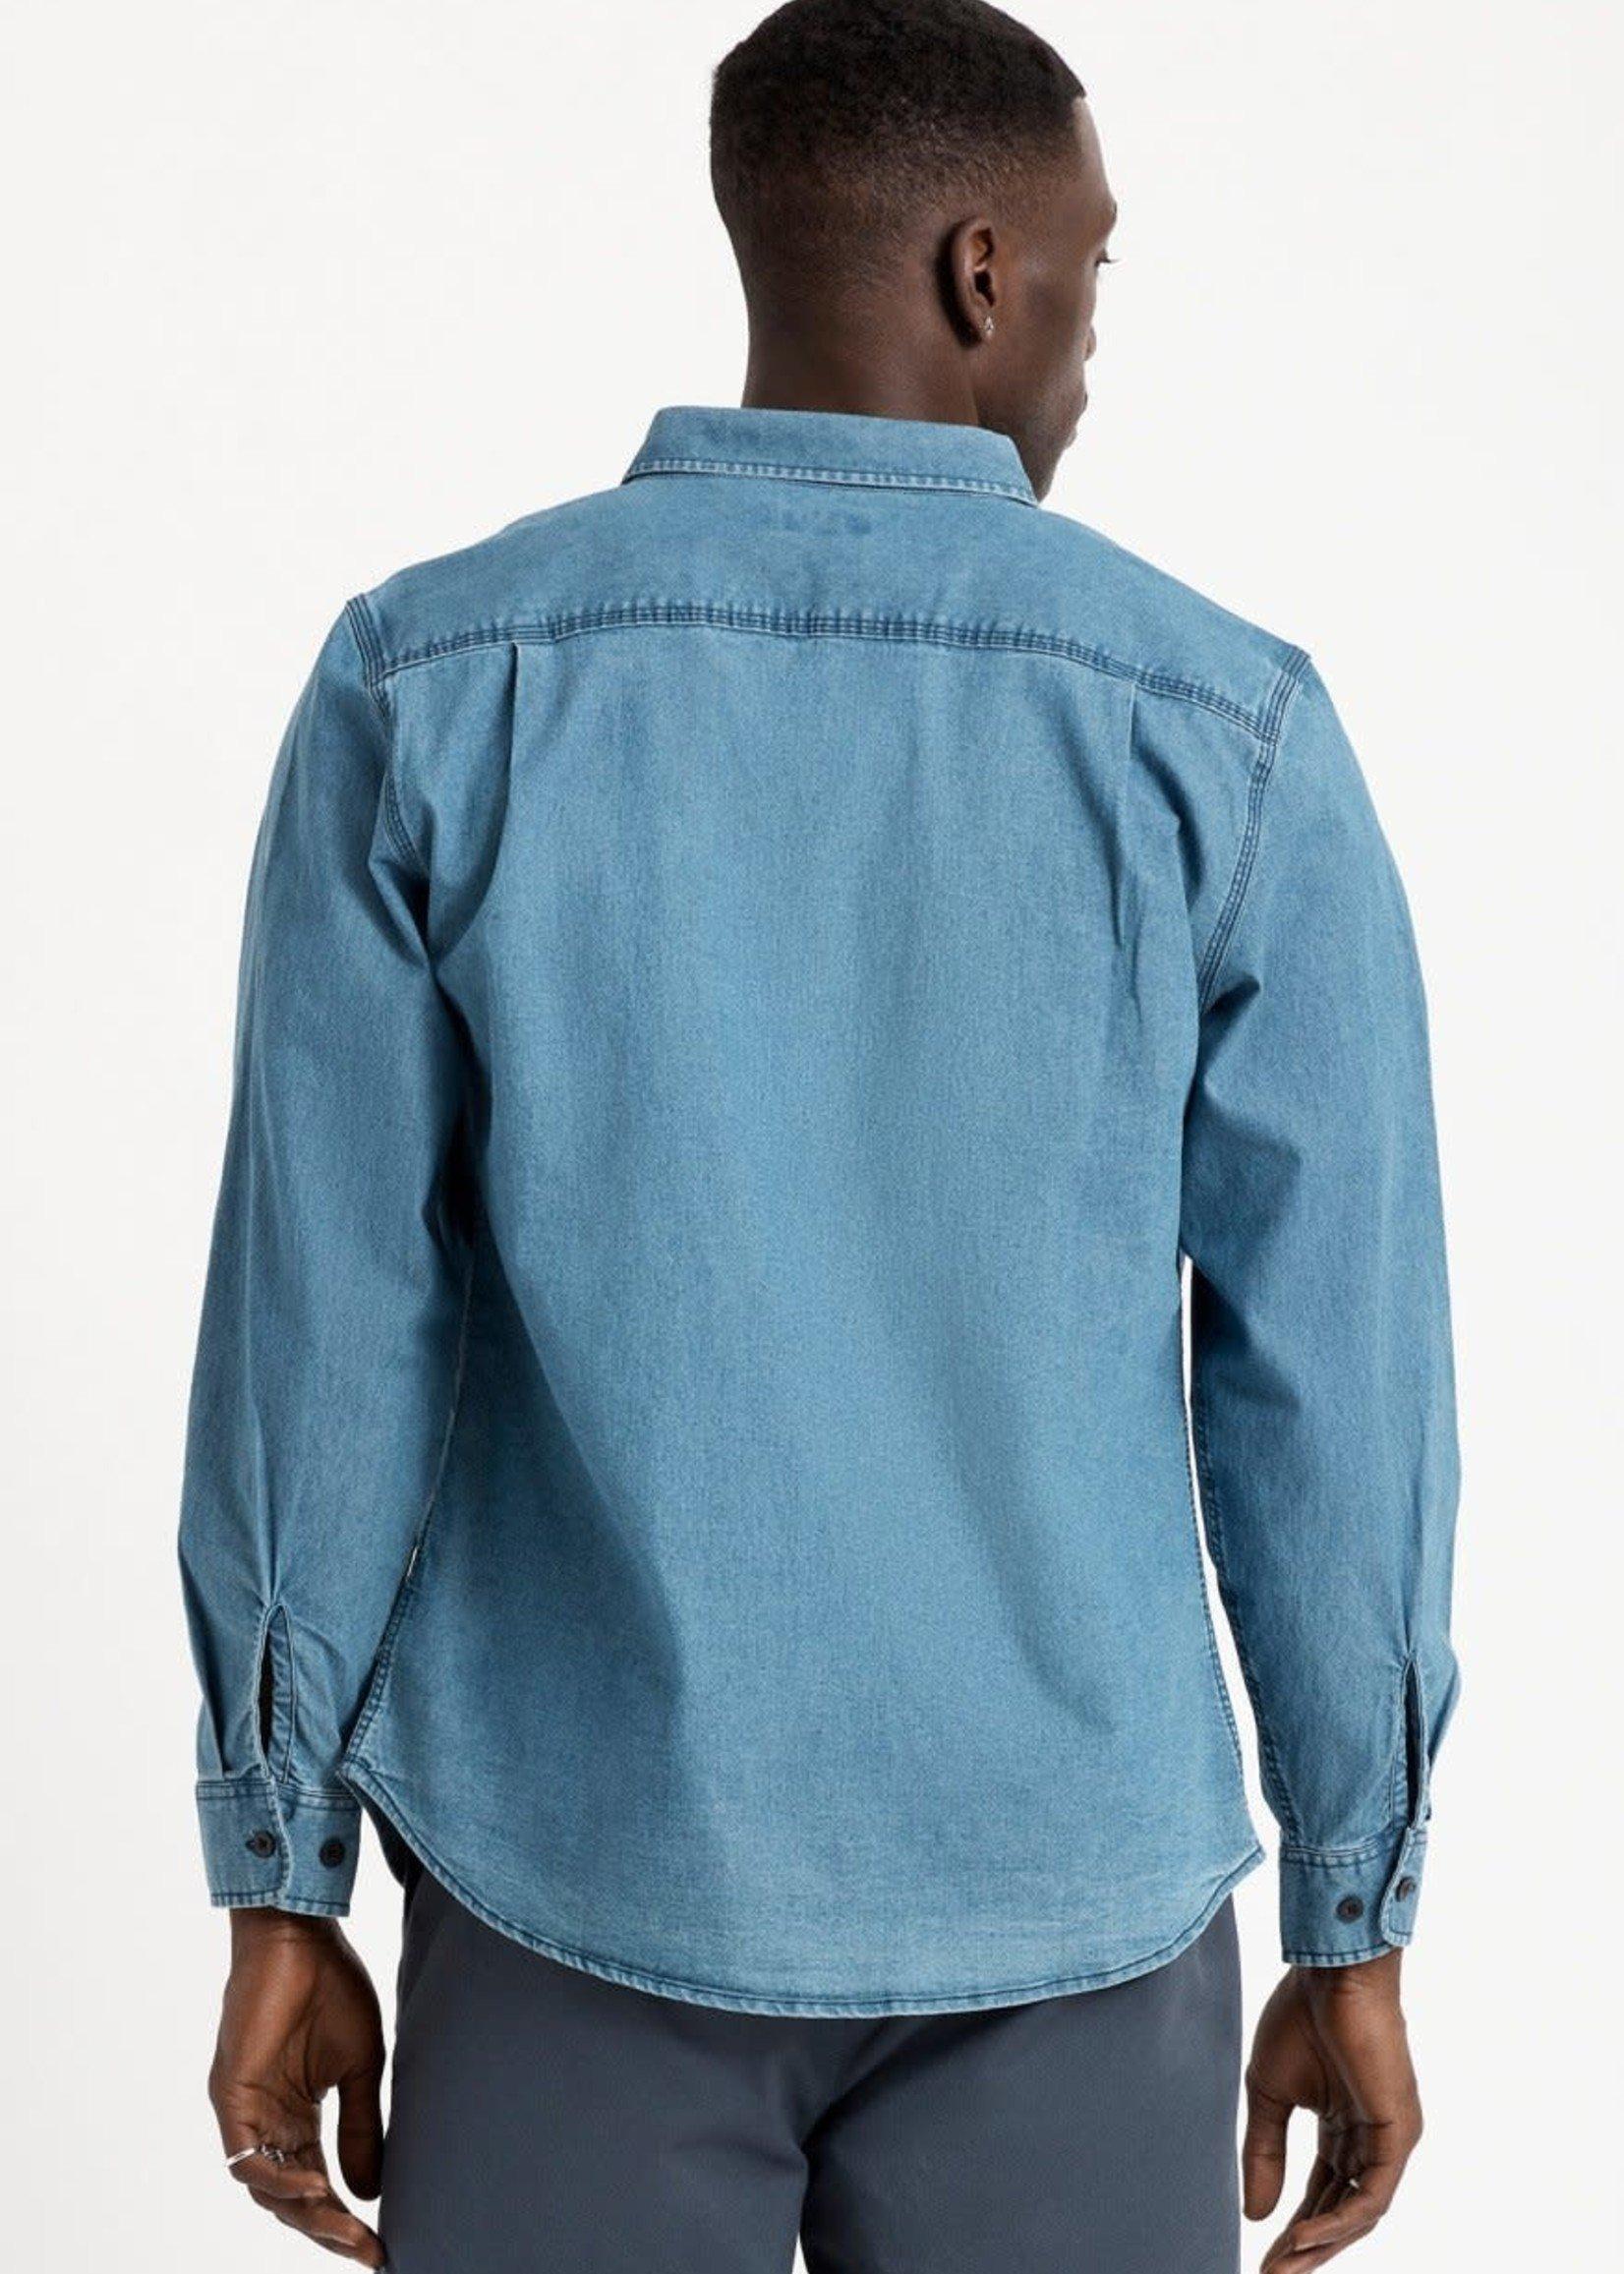 BRIXTON Bowery Lightweight L/S Crossover Shirt